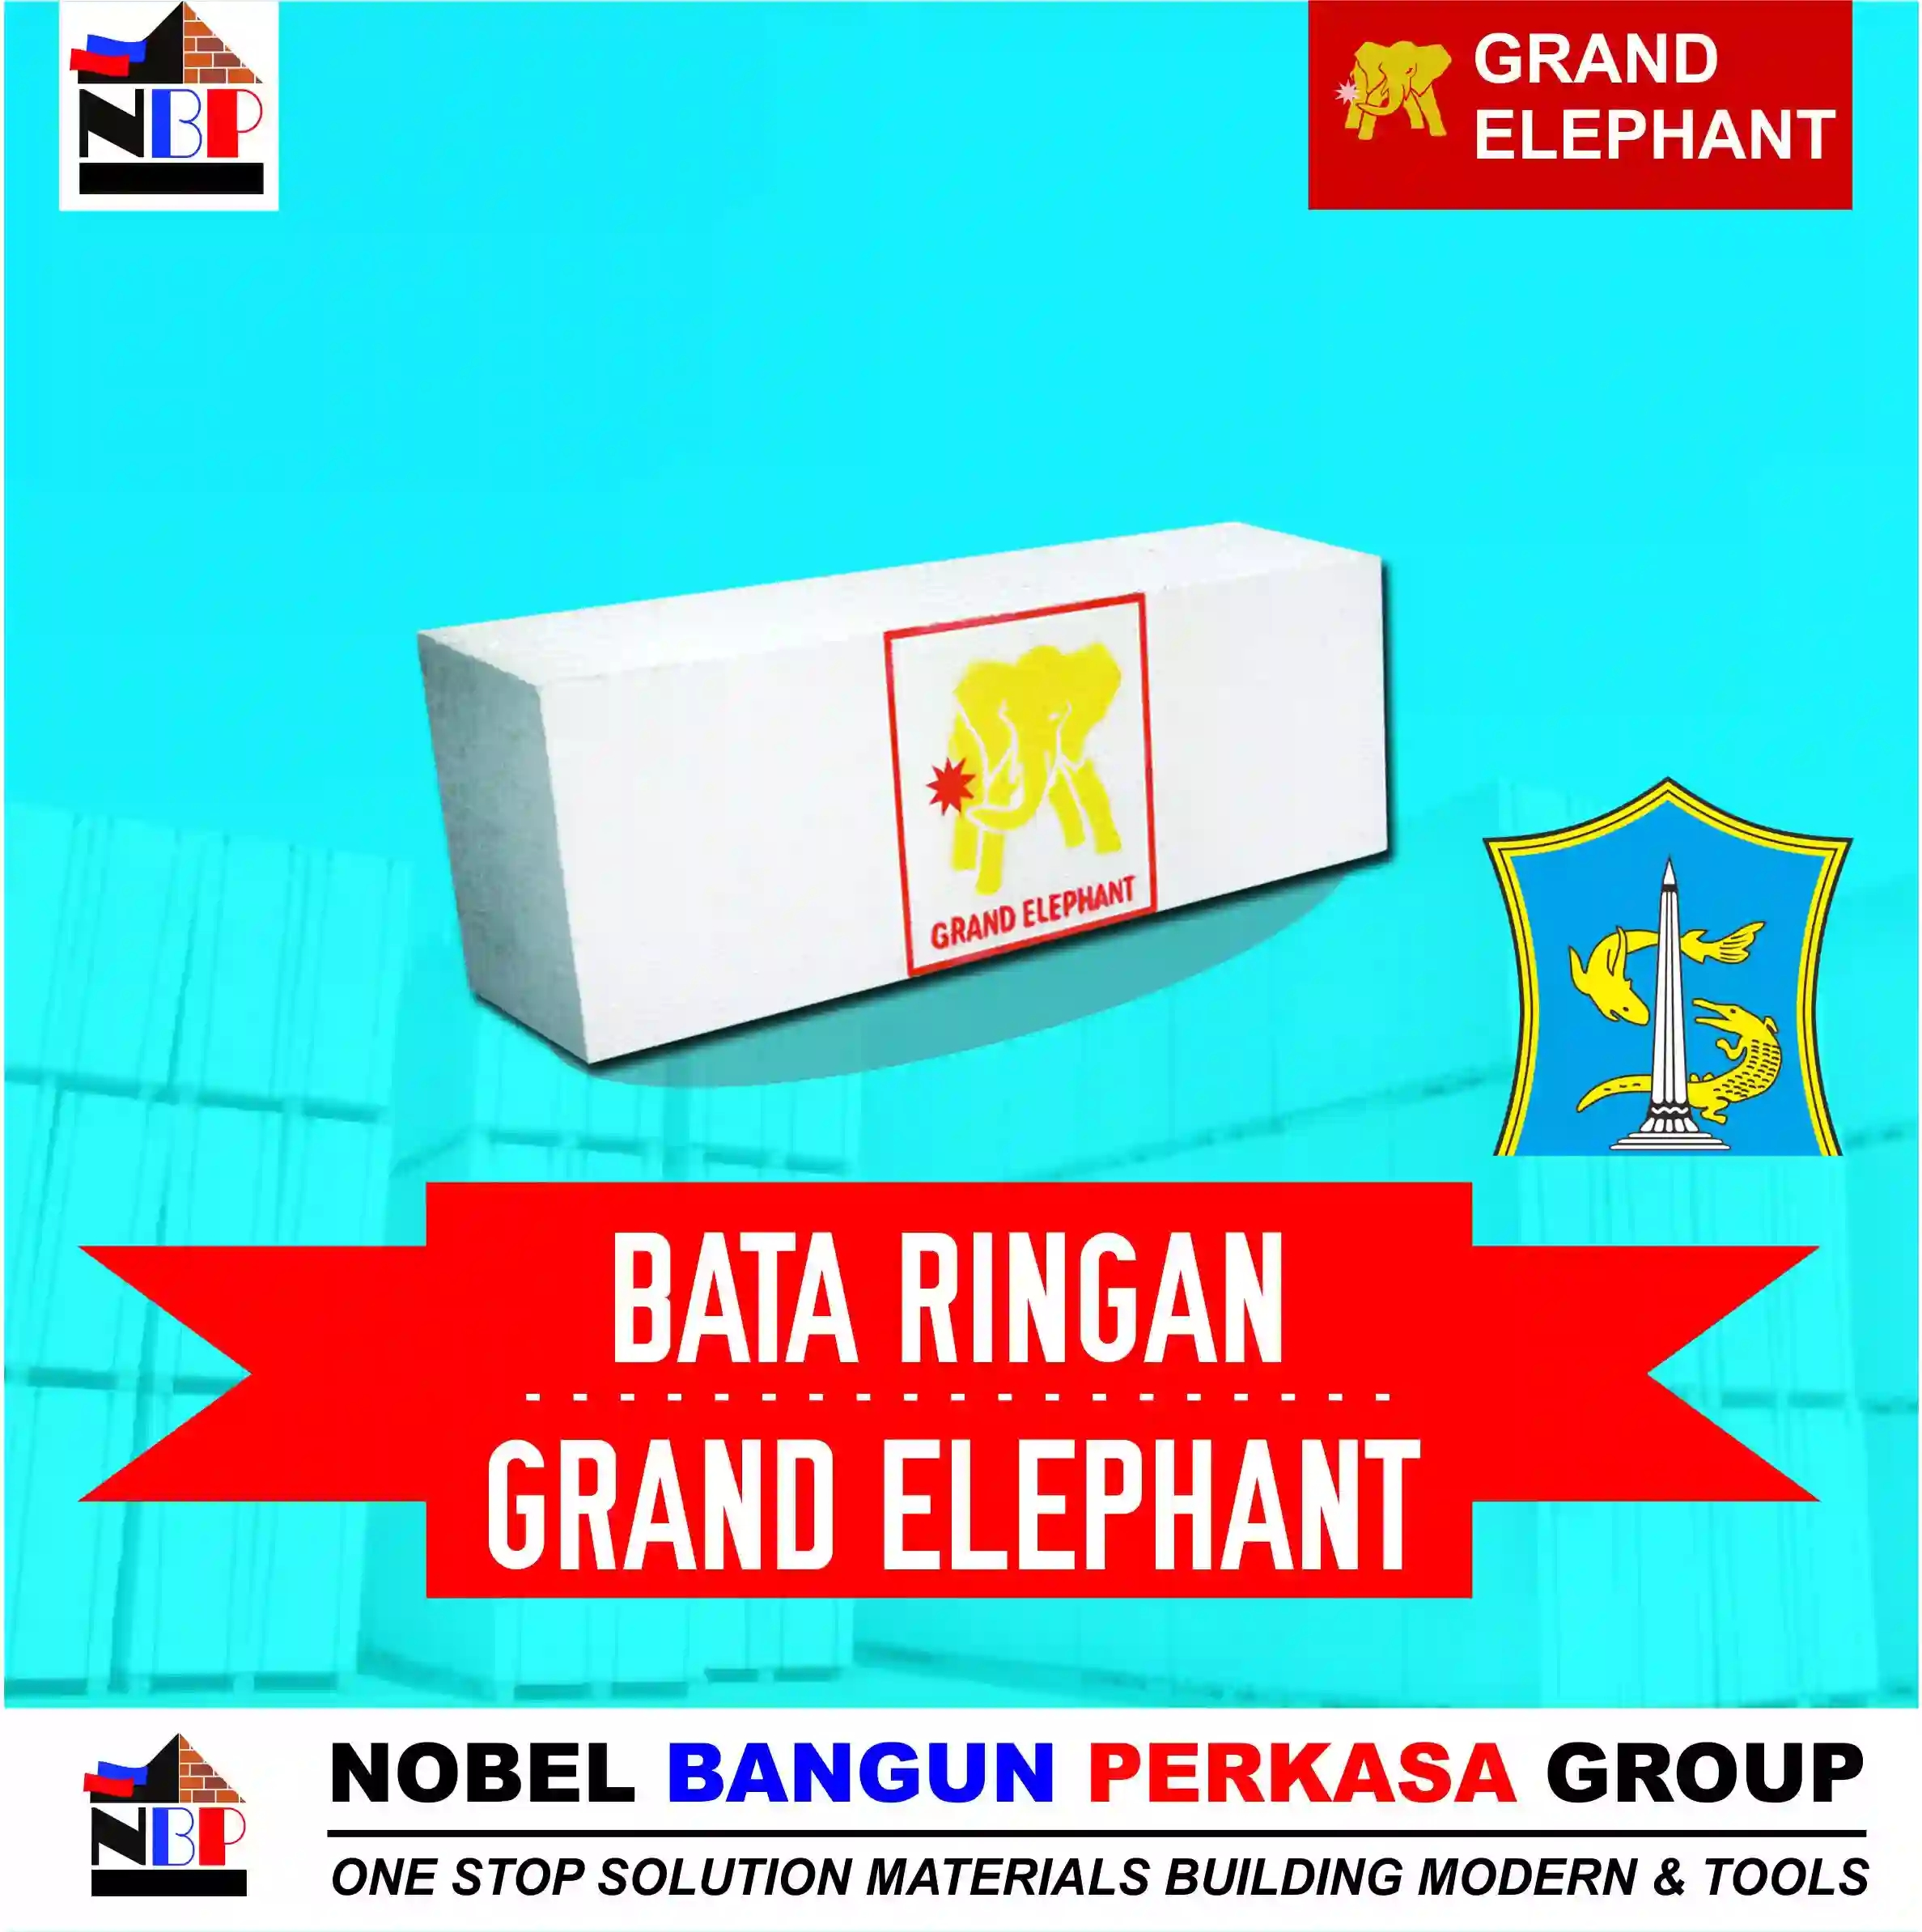 bata ringan hebel grand elephant surabaya